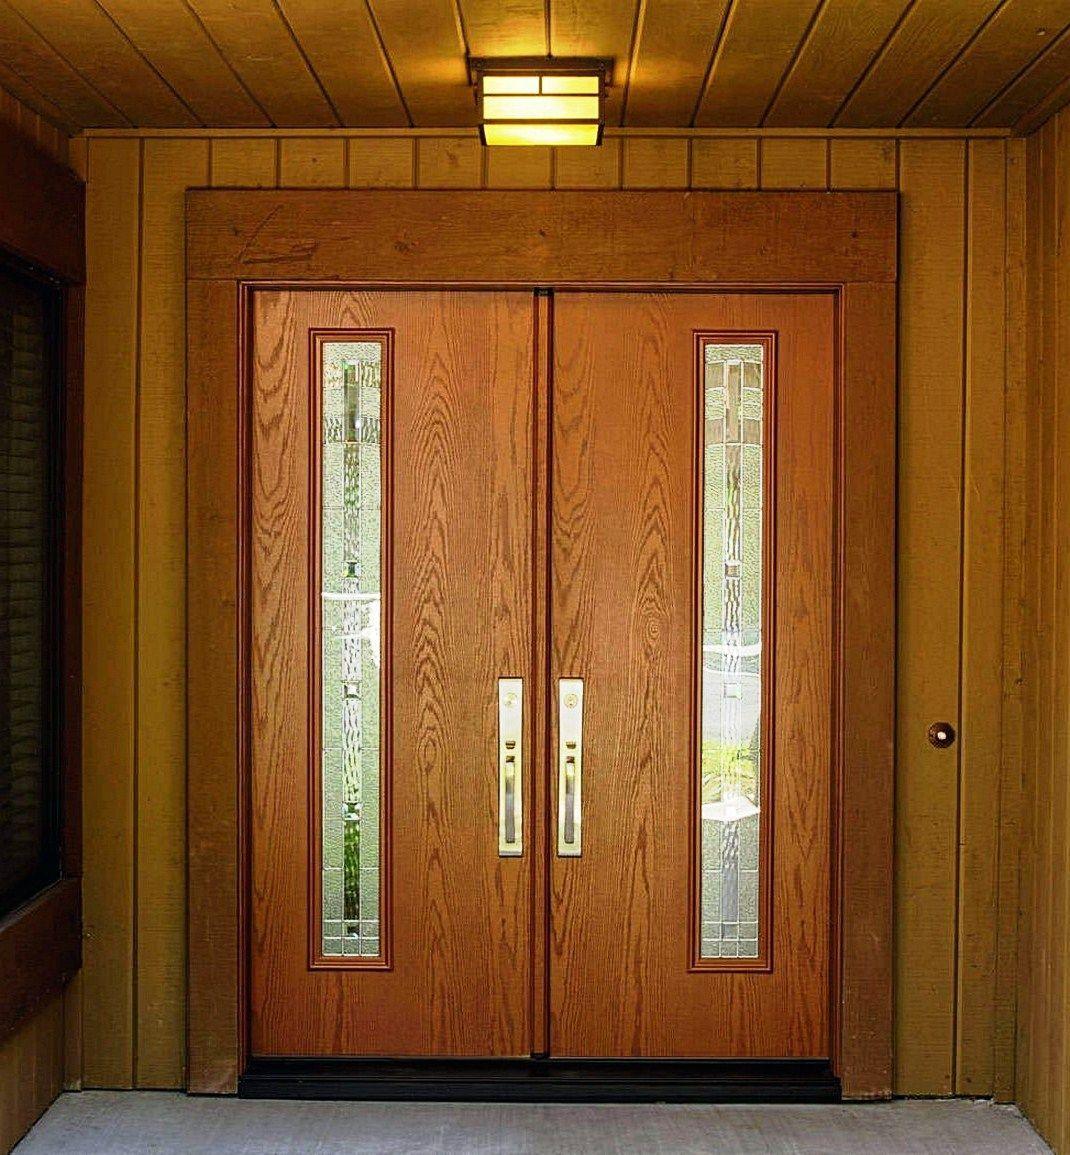 Pin Oleh Nurul Qomariyah Di Desain Pintu Rumah Modern Minimalis Pintu Minimalis Rumah Minimalis